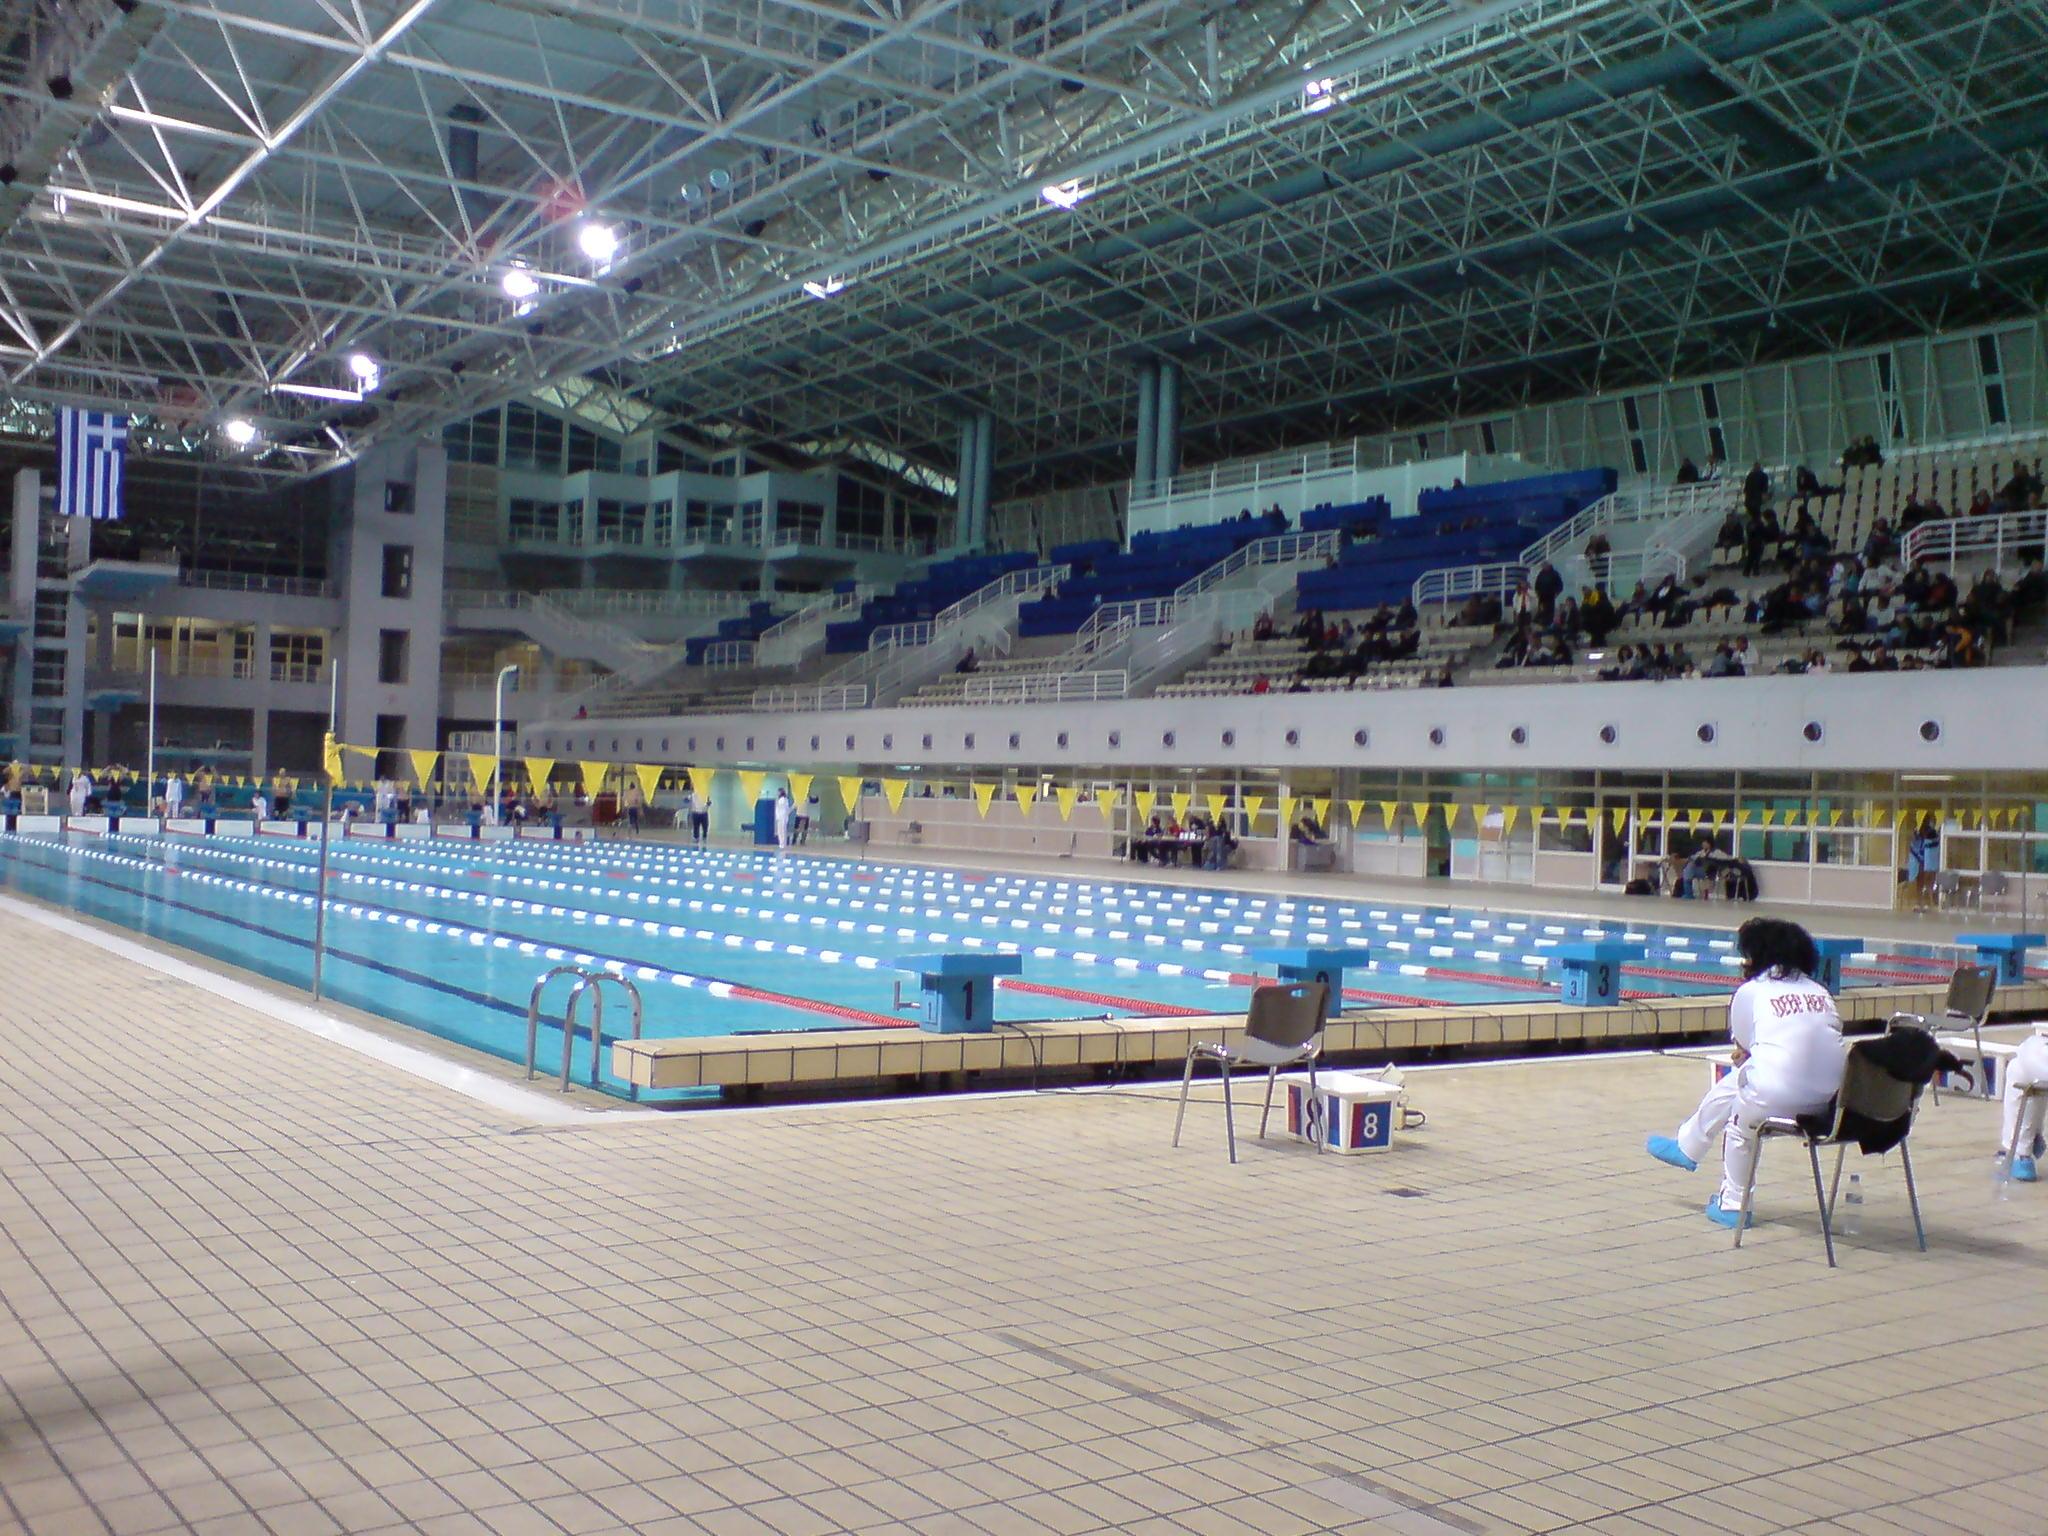 1c627549141 Κολυμβητήριο : Ολυμπιακό Κέντρο Κολύμβησης Αθηνών Triathlon ...